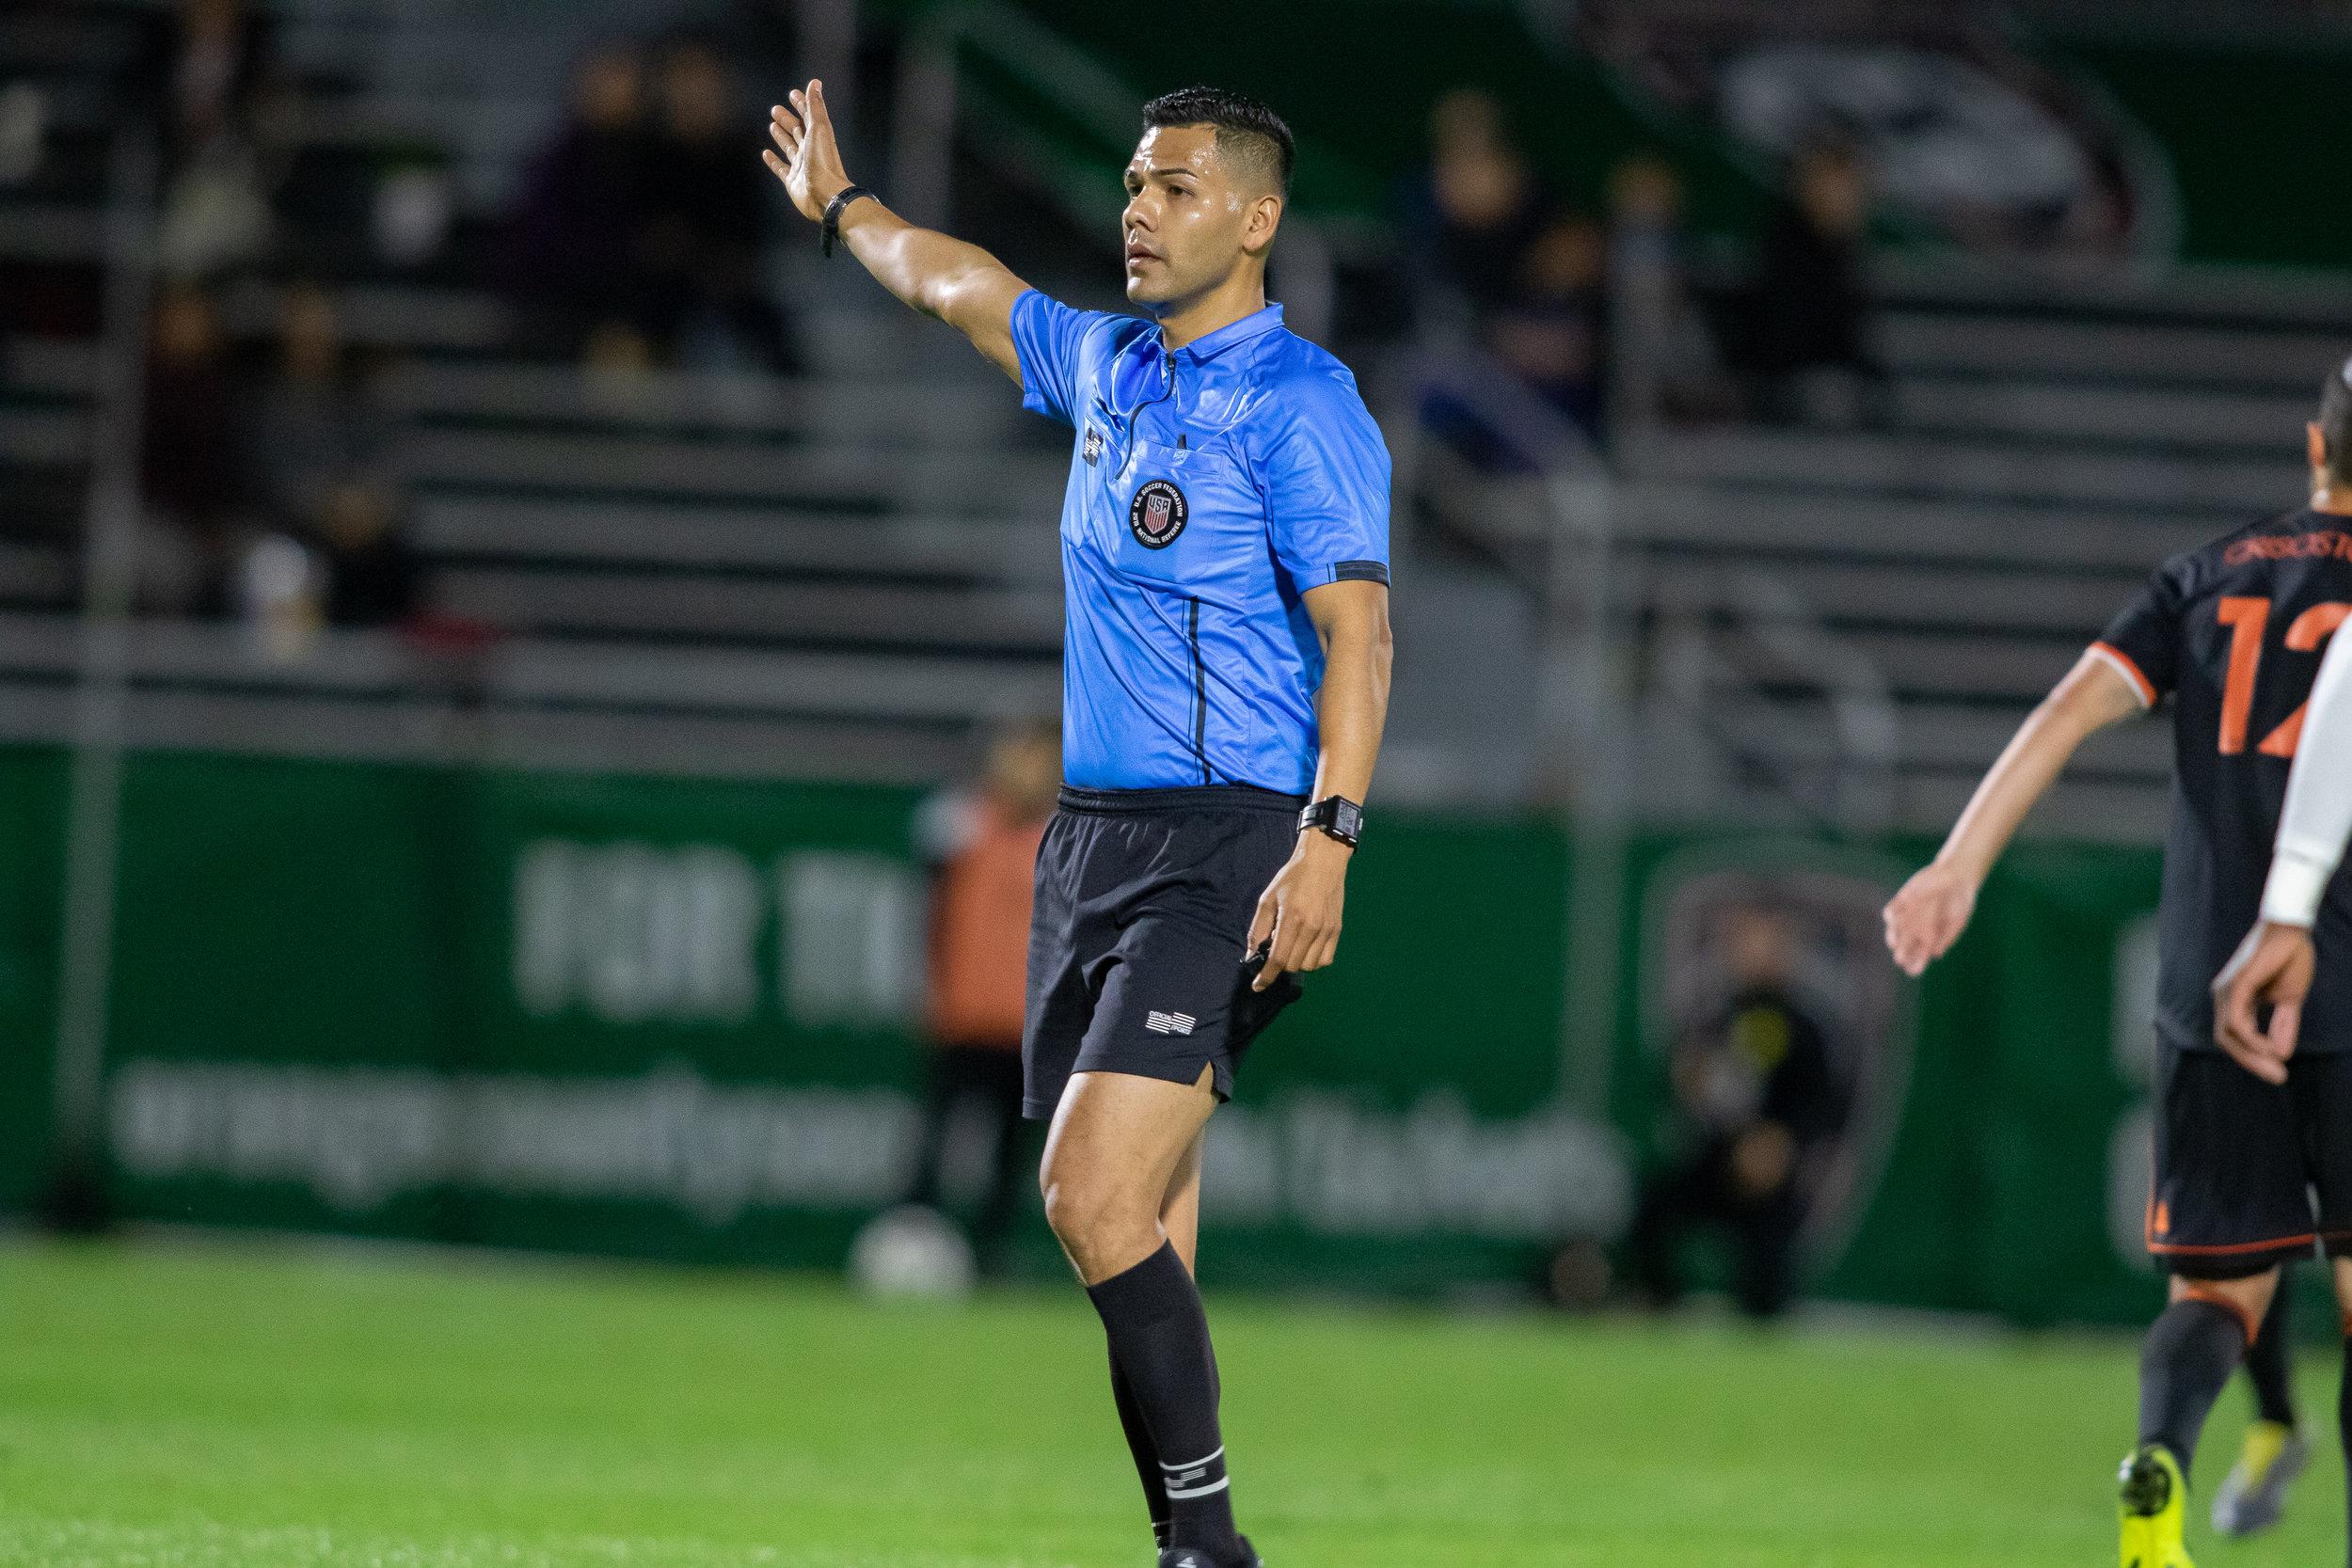 Referee Gustavo Solorio makes a call at Championship Soccer Stadium | Photo courtesy of Orange County SC